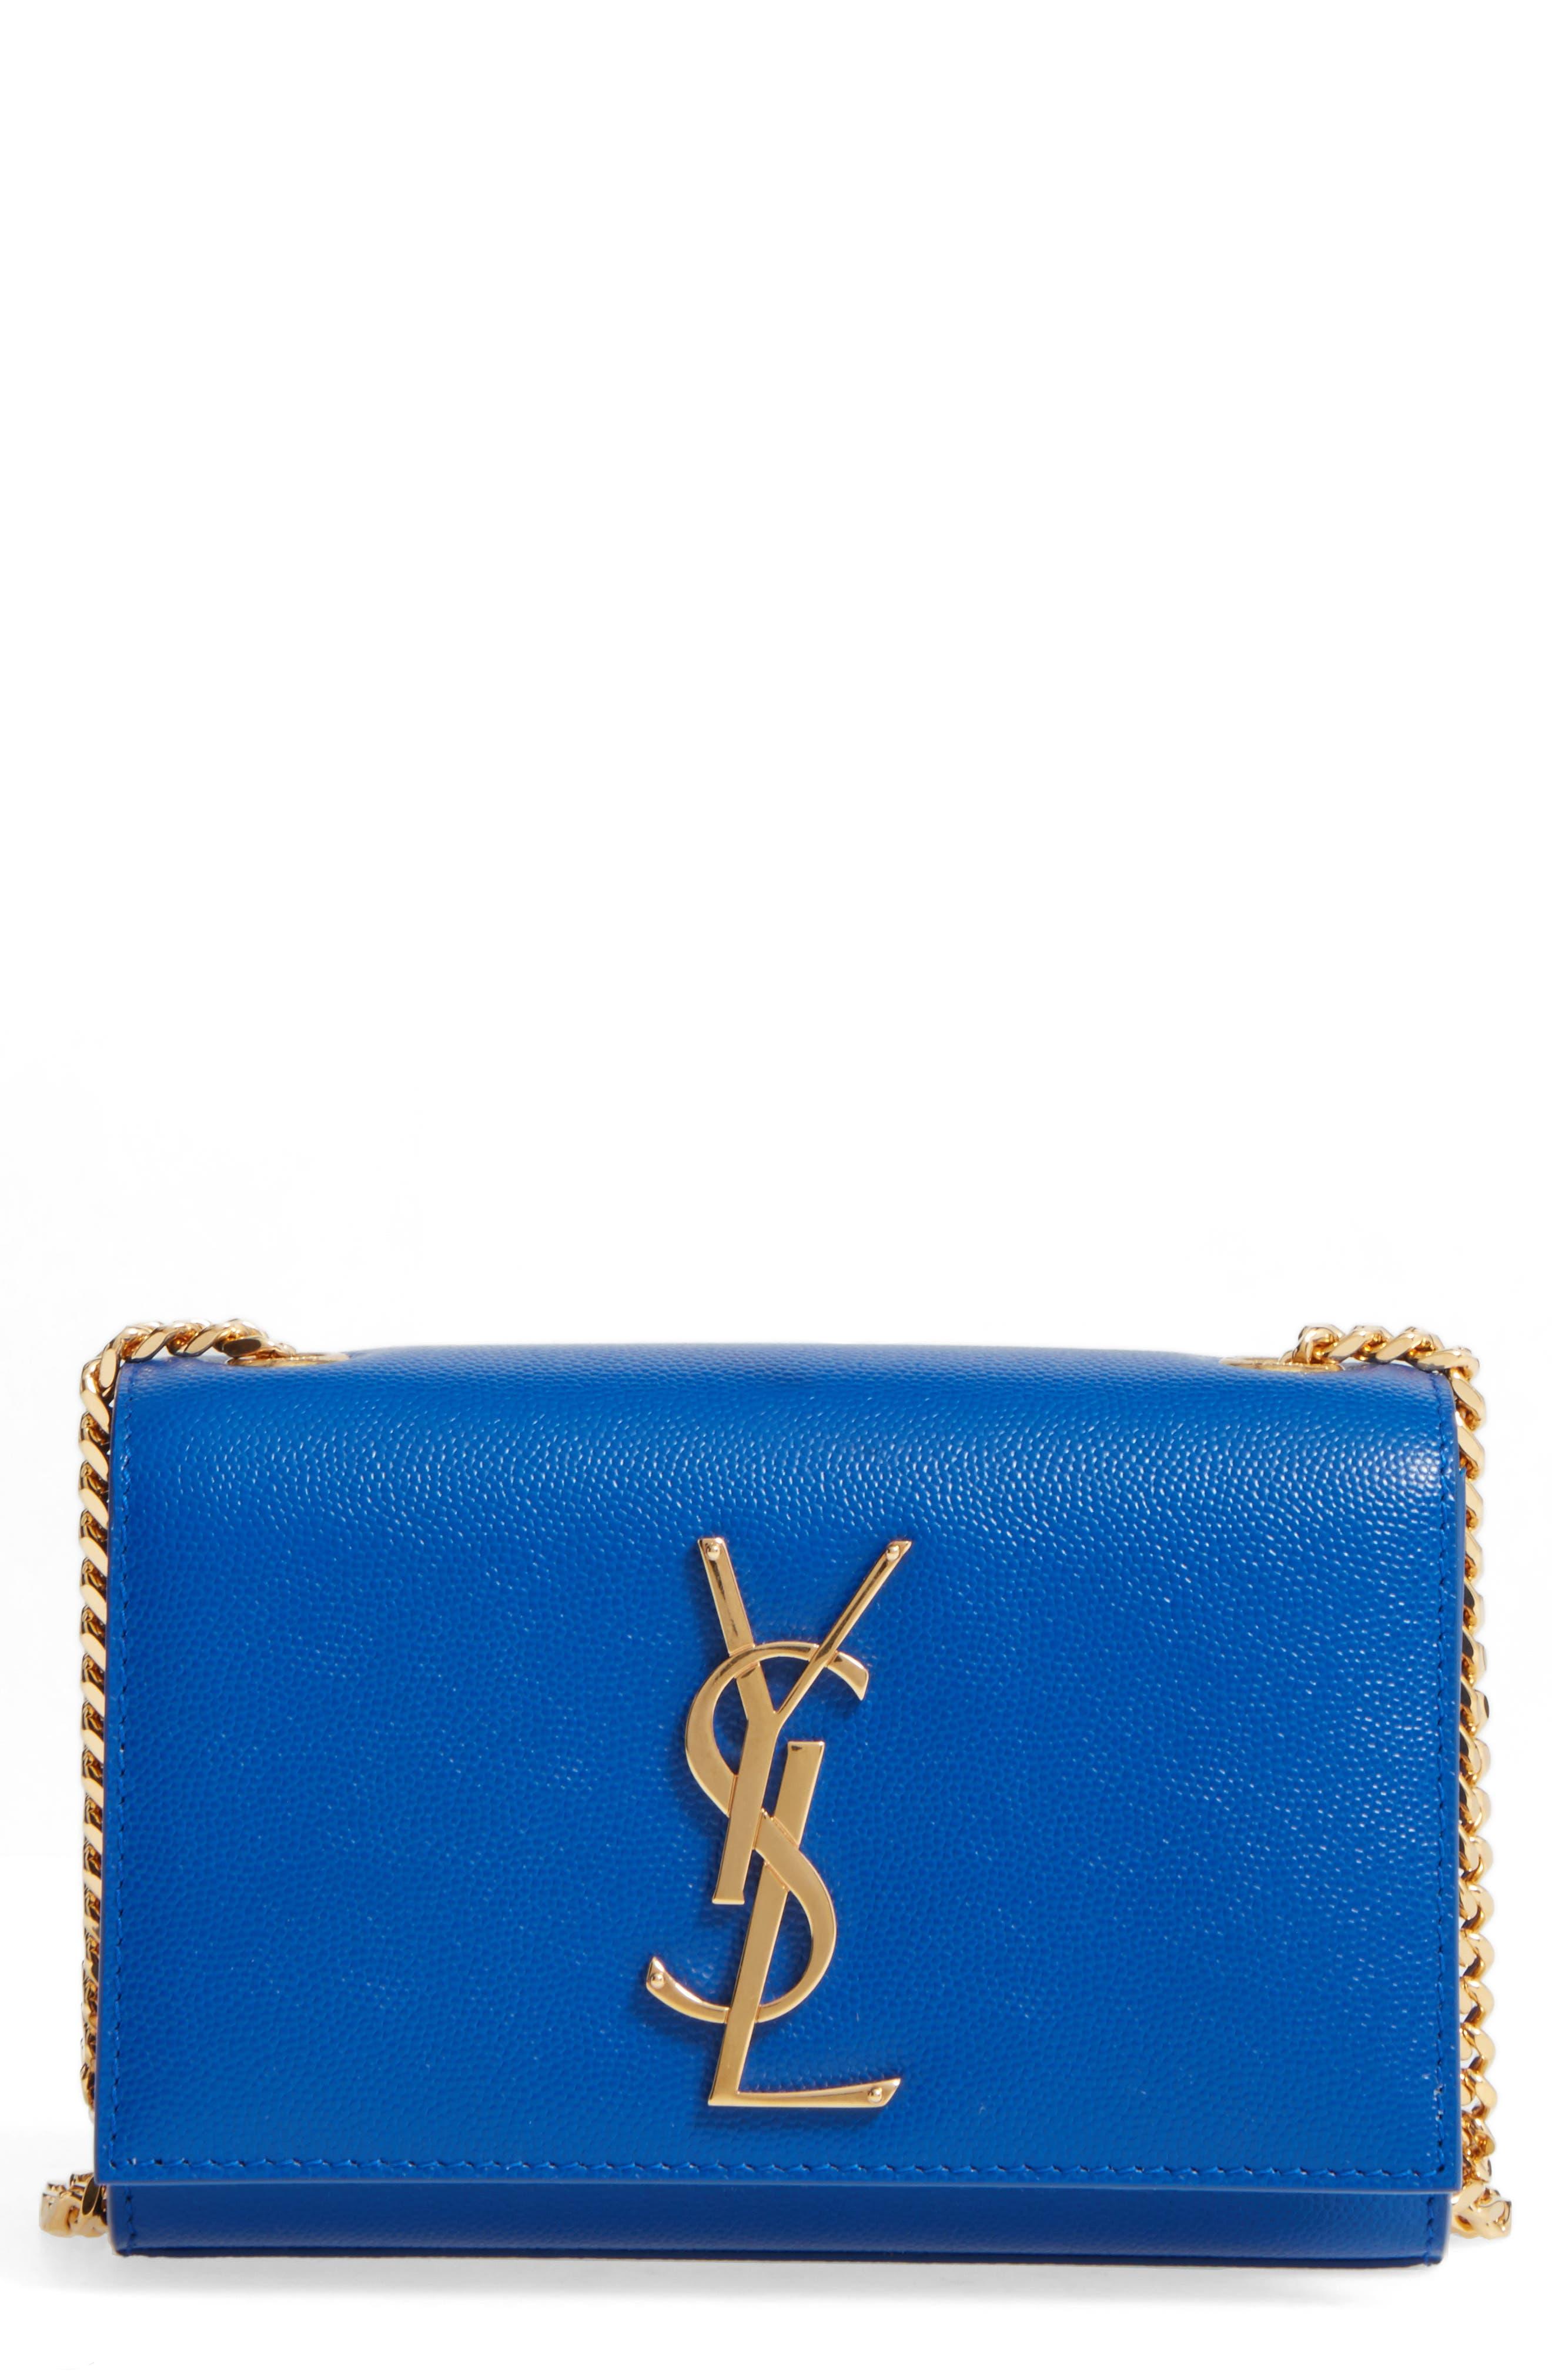 Saint Laurent 'Small Monogram' Crossbody Bag